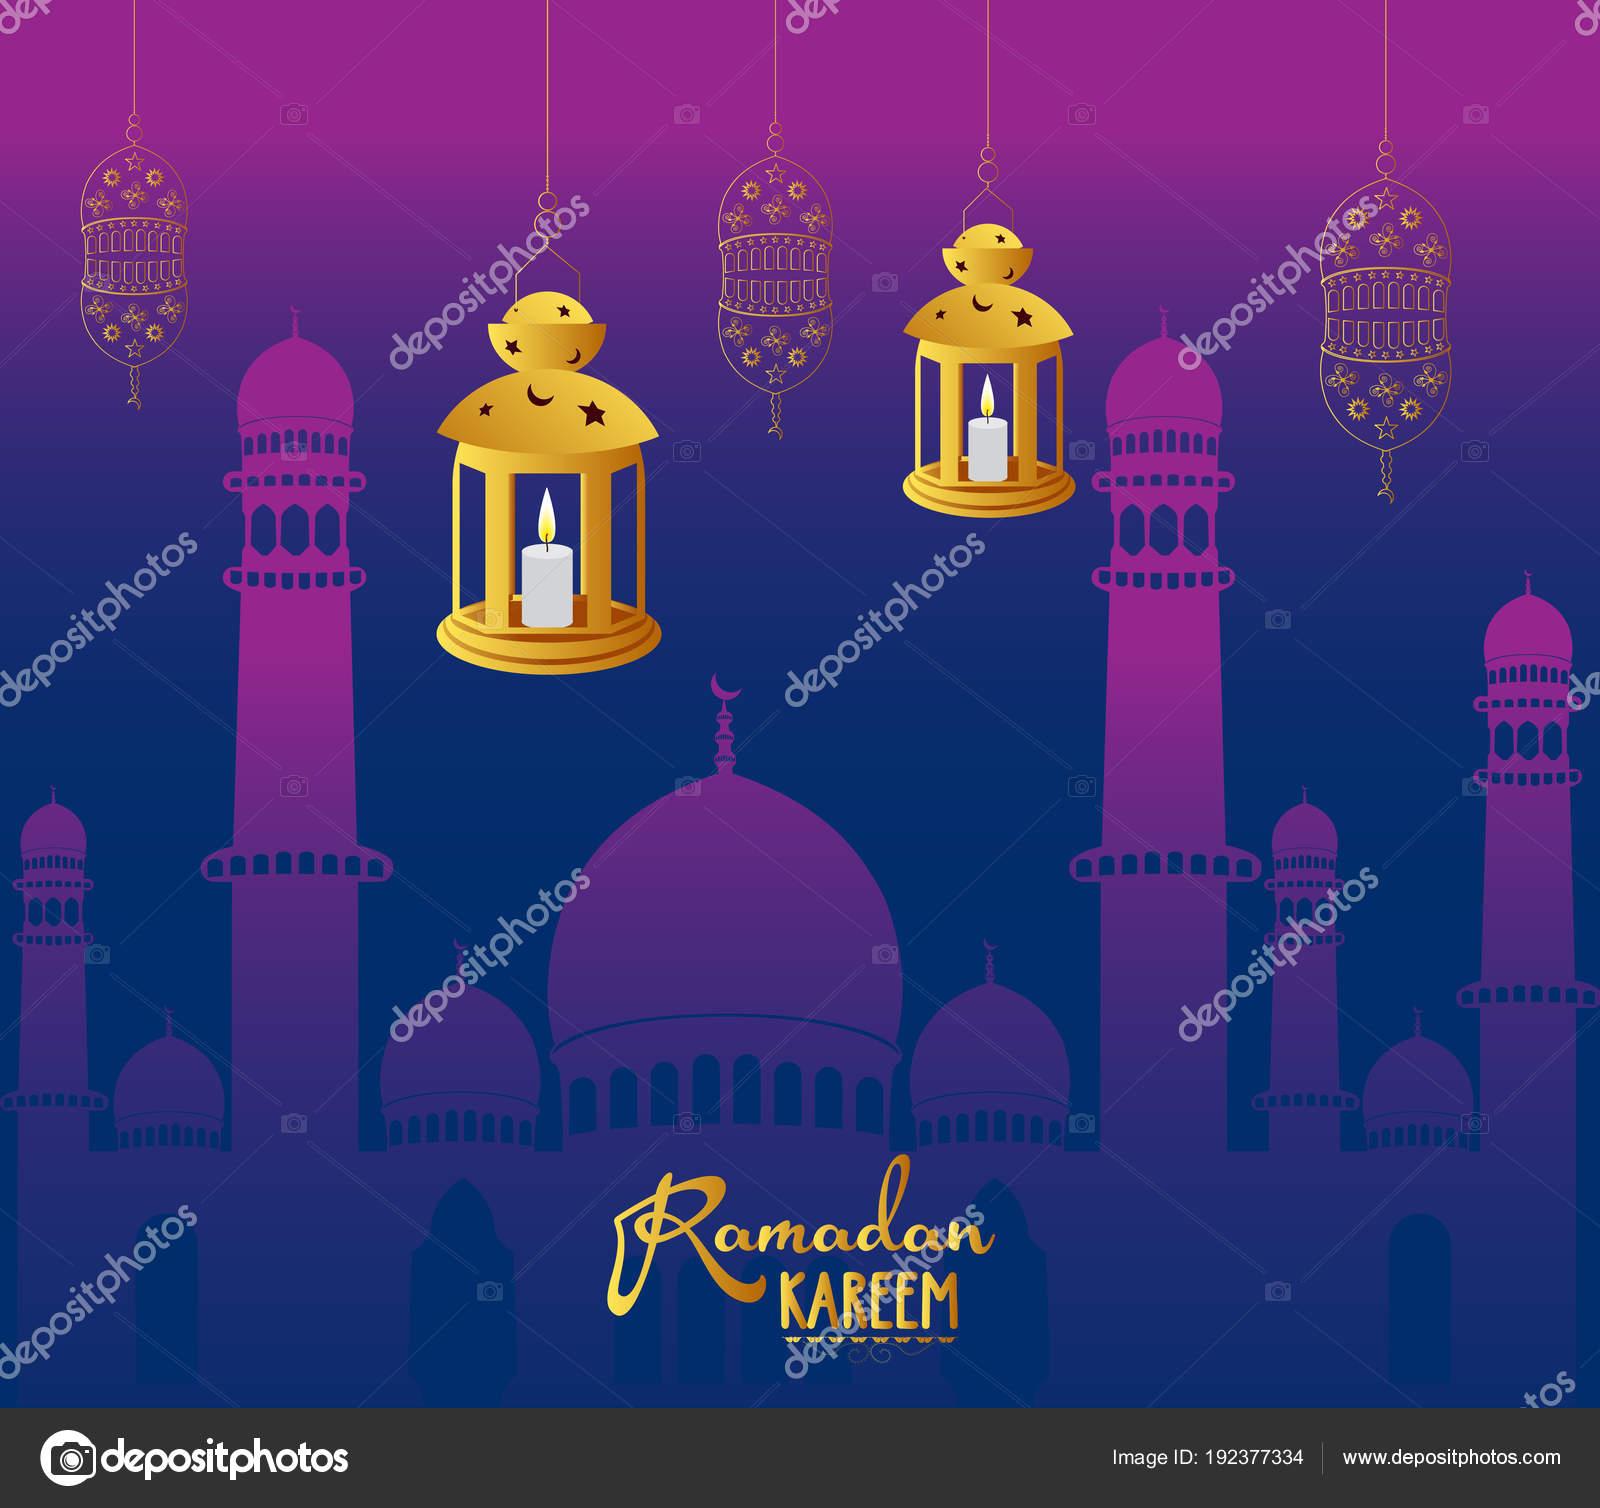 Ramadan Kareem Wallpaper Design Template — Stock Vector